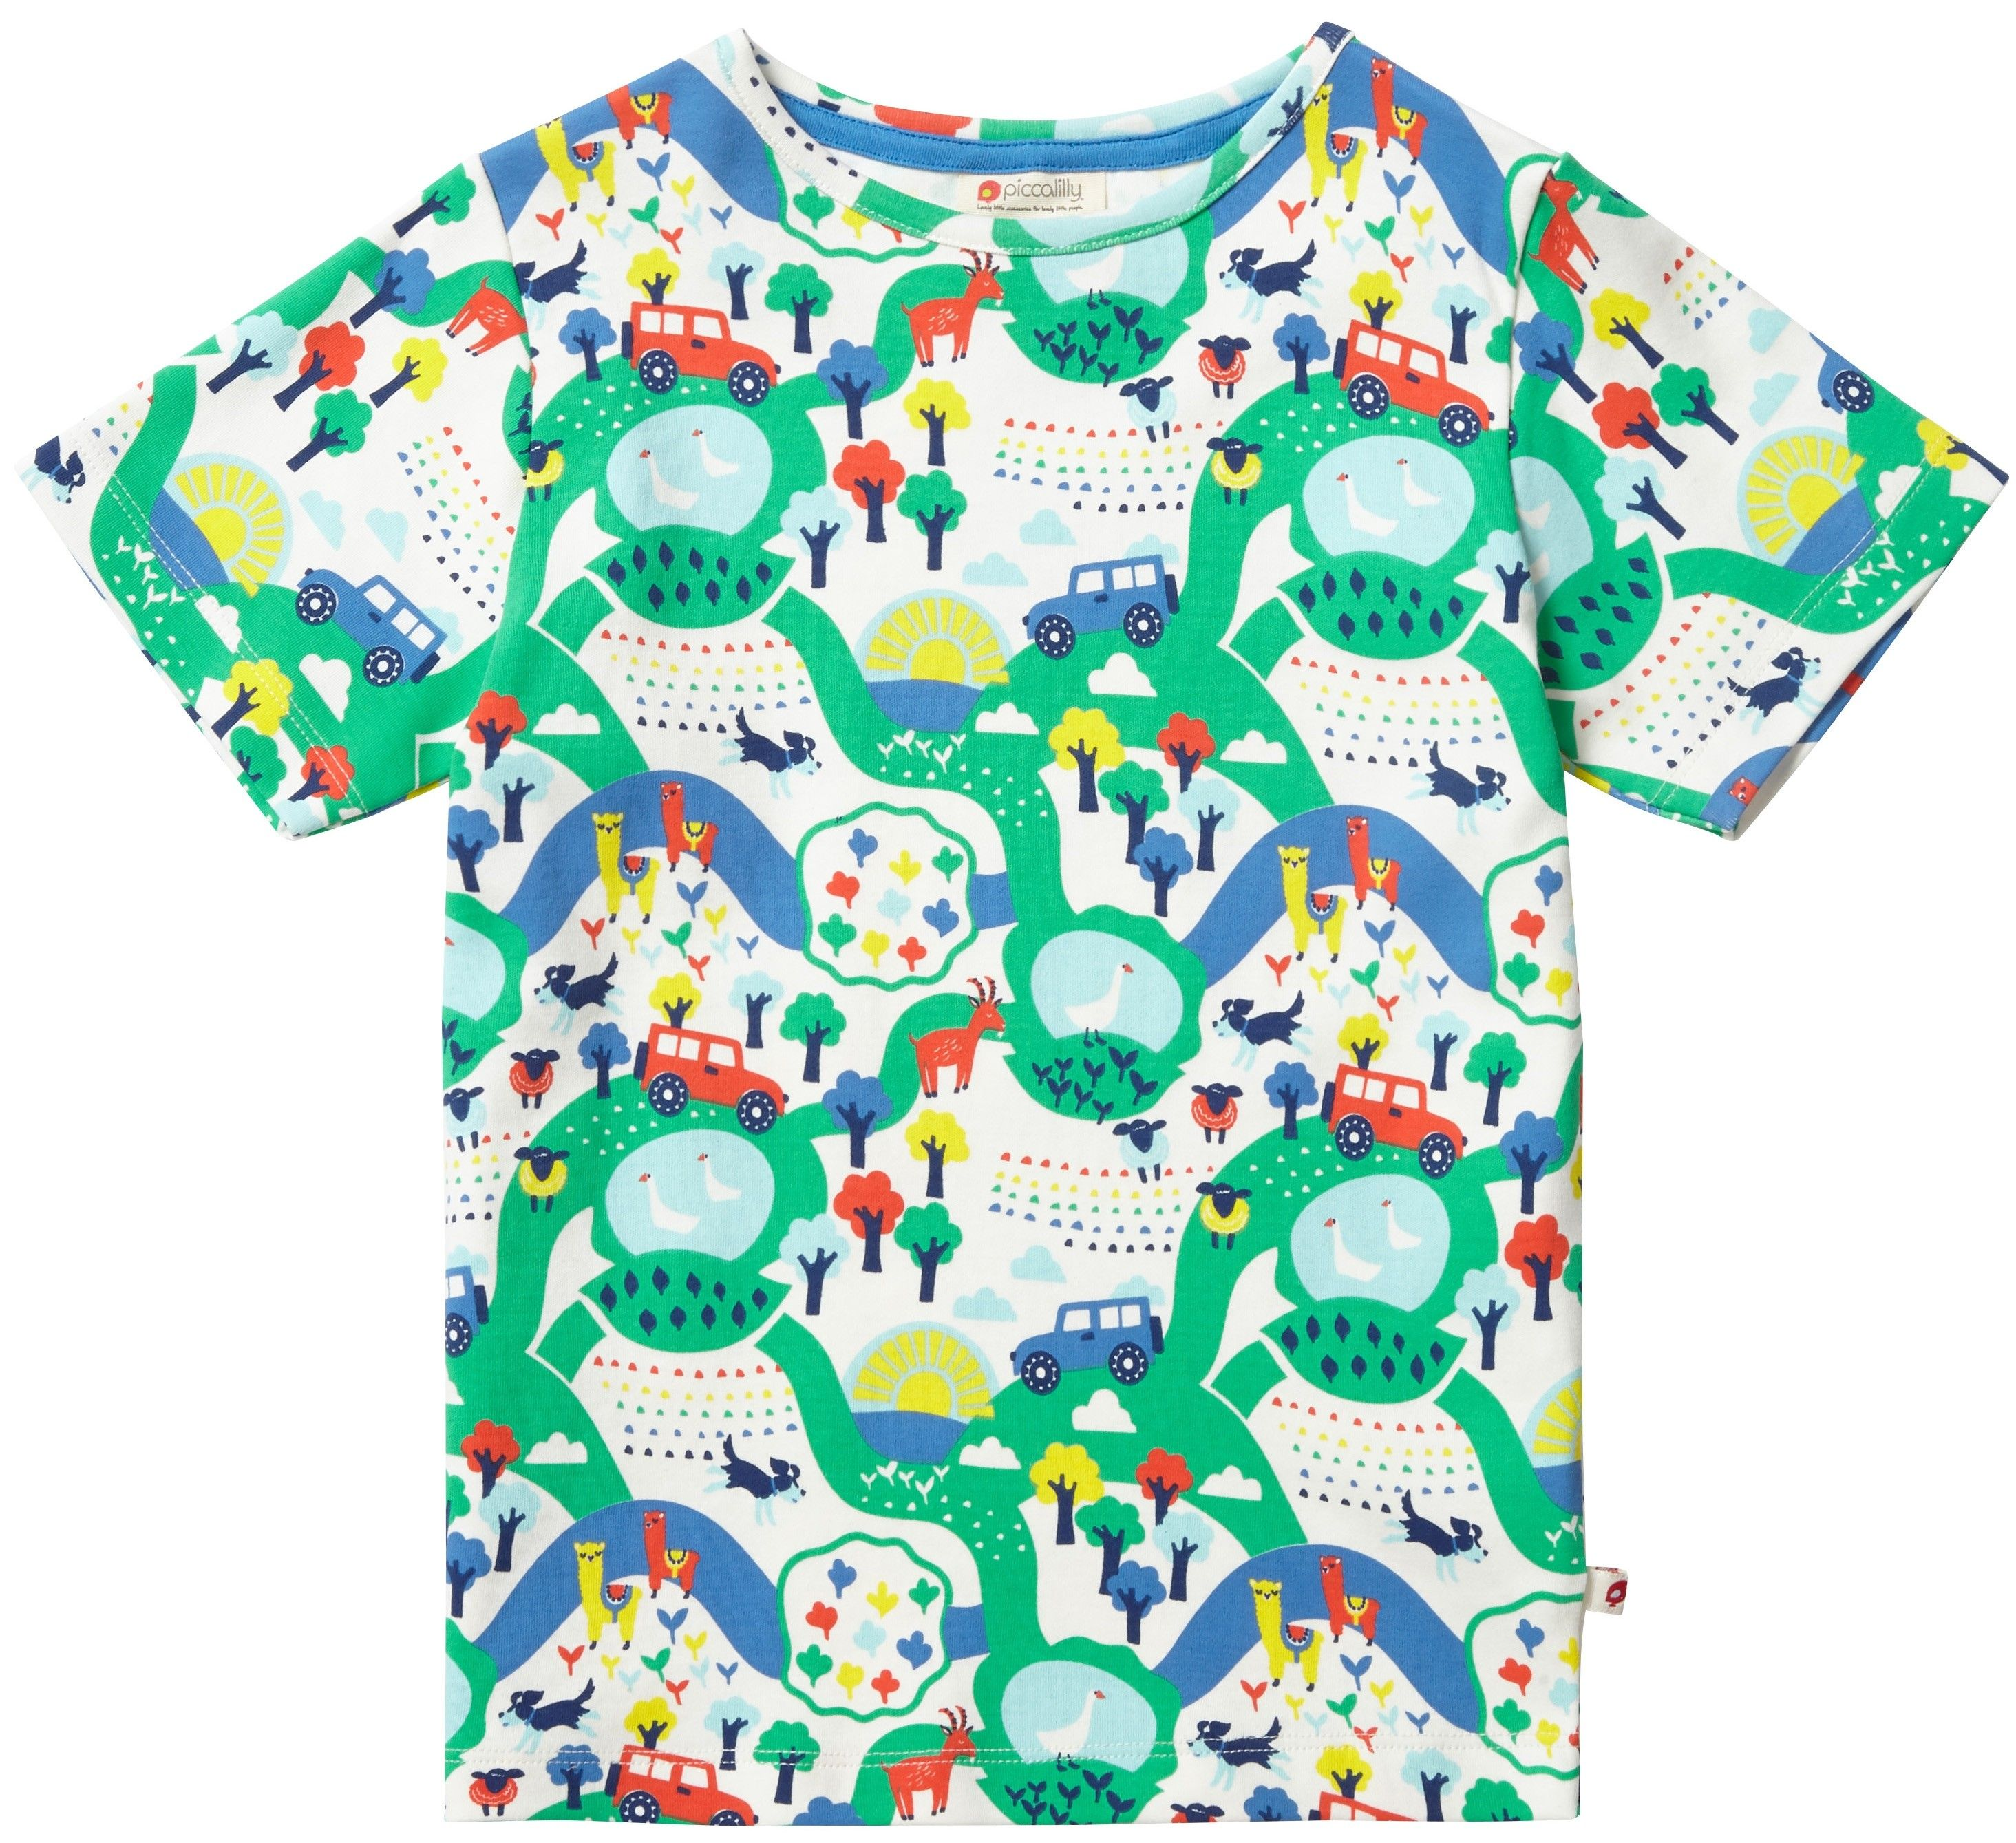 e779781e5 T-Shirt - Malham Farm | Piccalilly Spring 2019 Collection | Mens ...